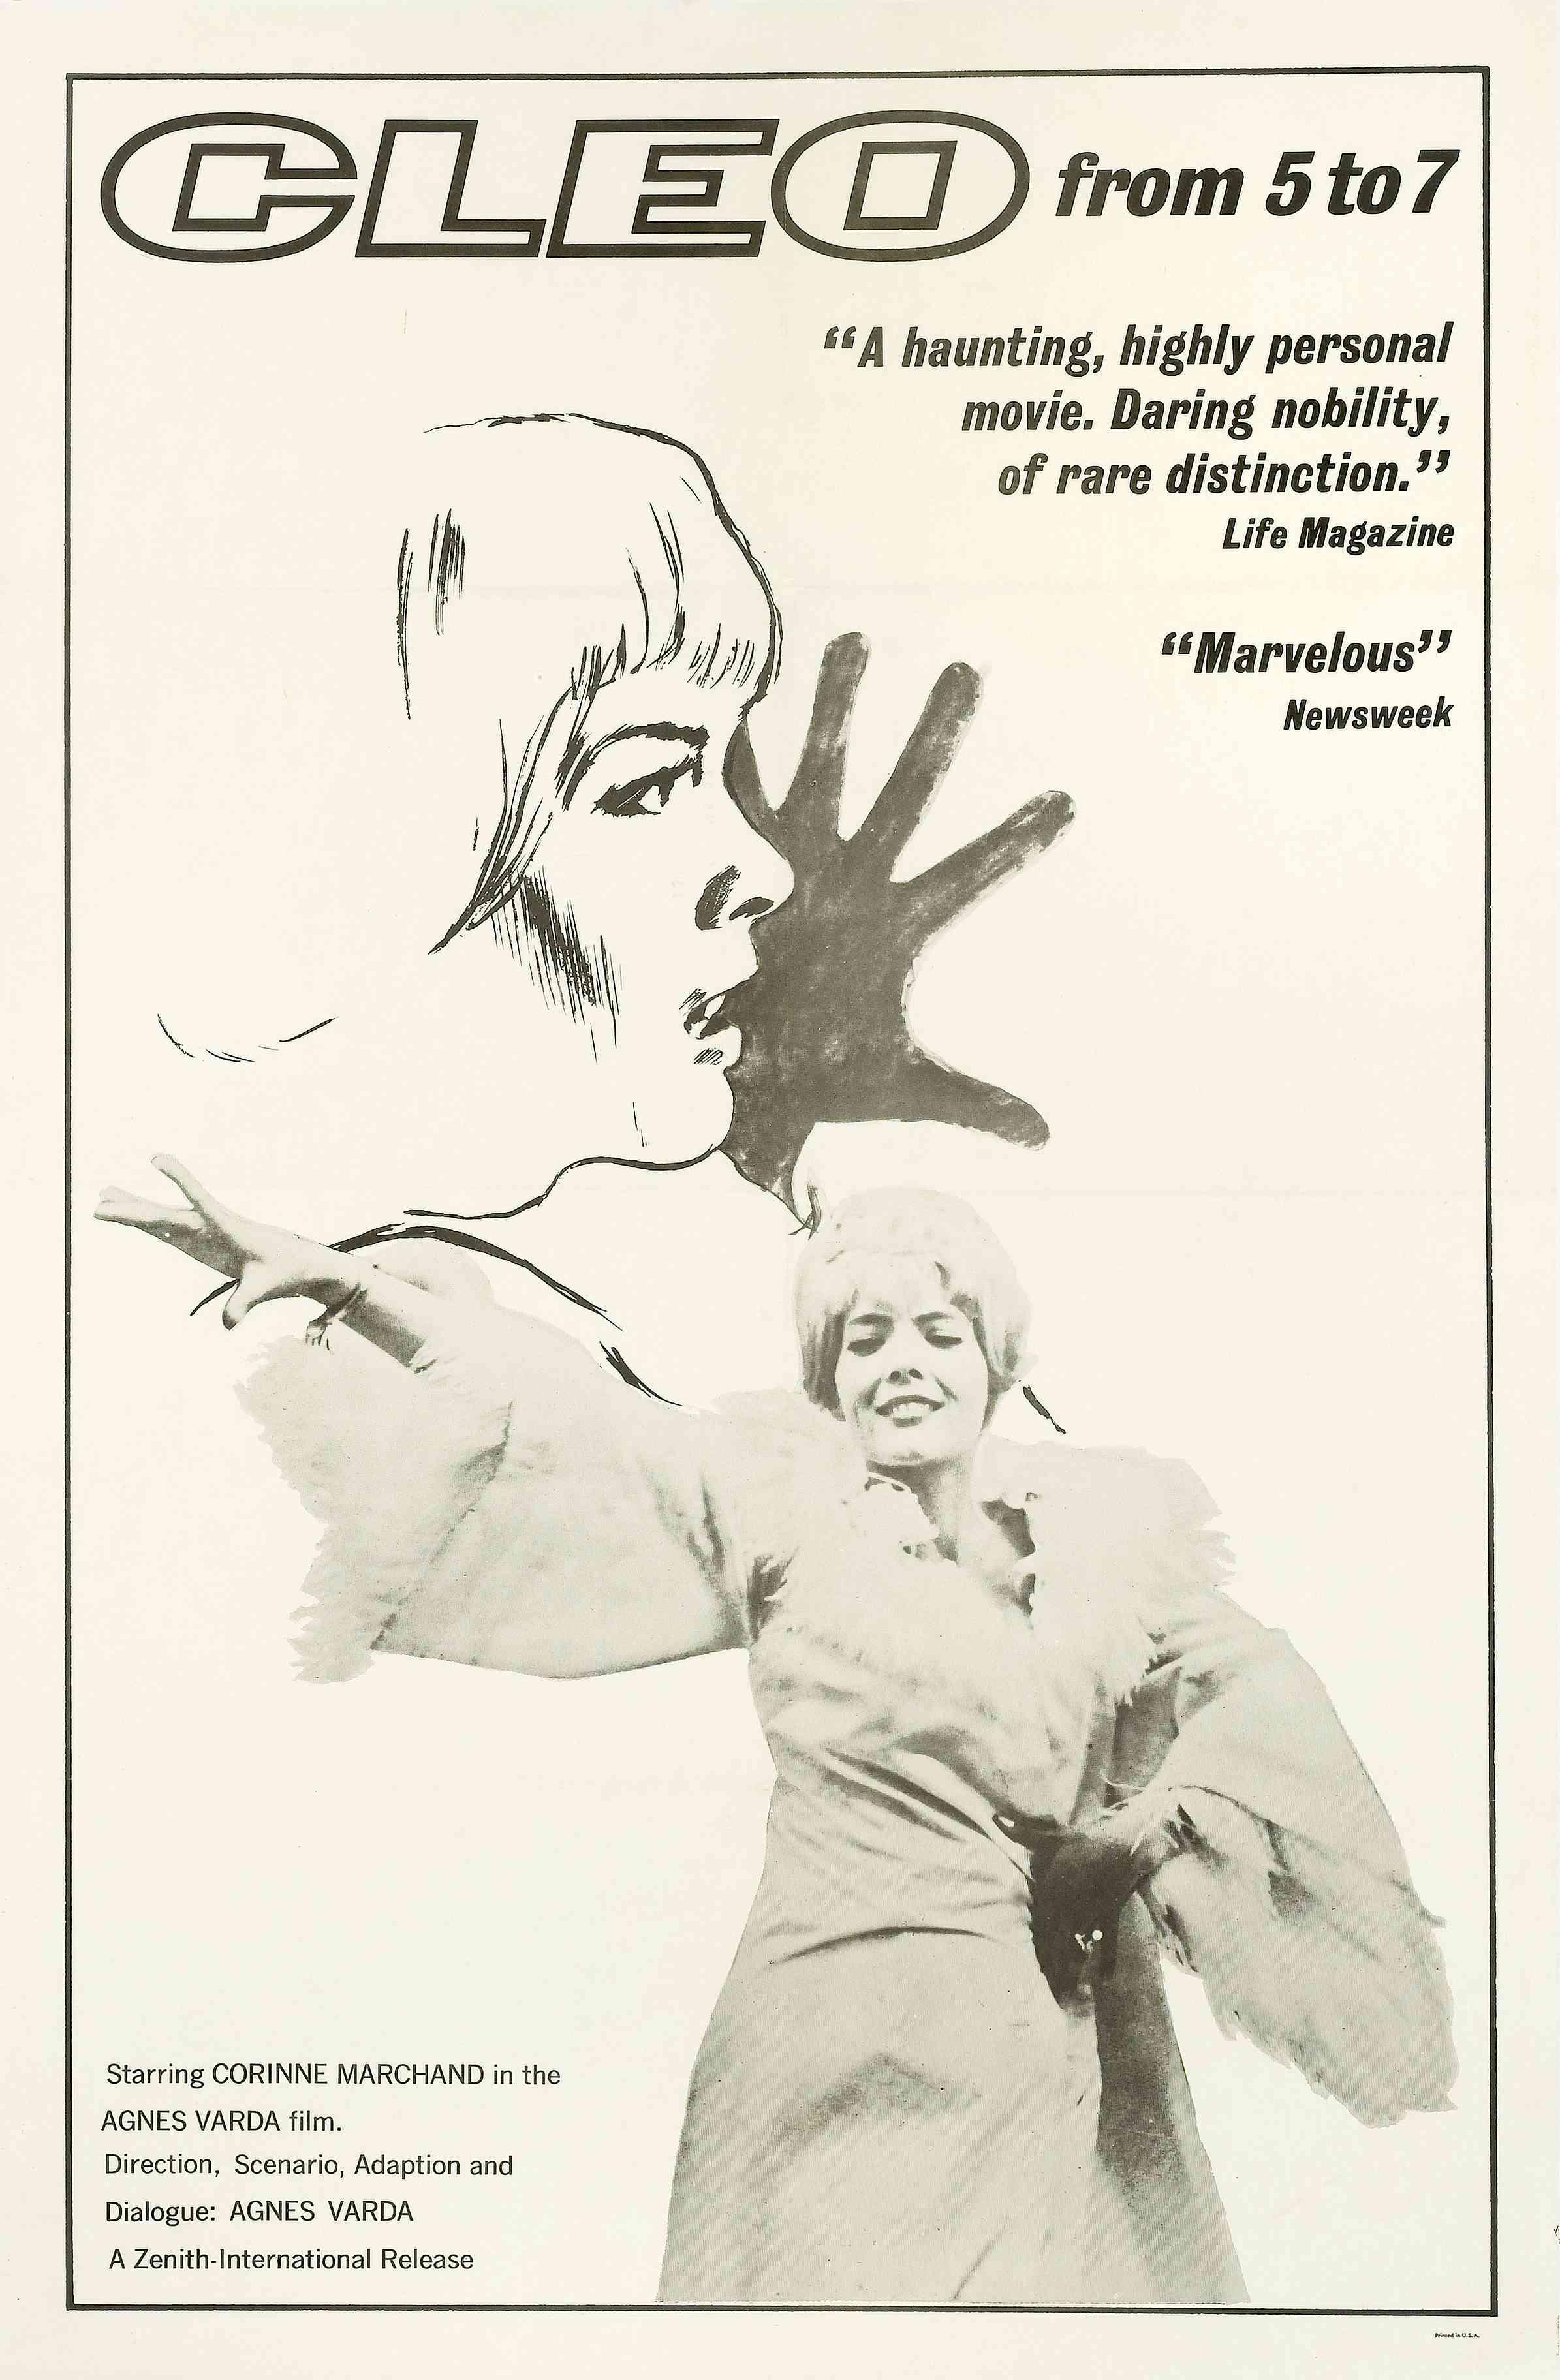 Cléo de 5 à 7, a film by Agnès Varda, film poster